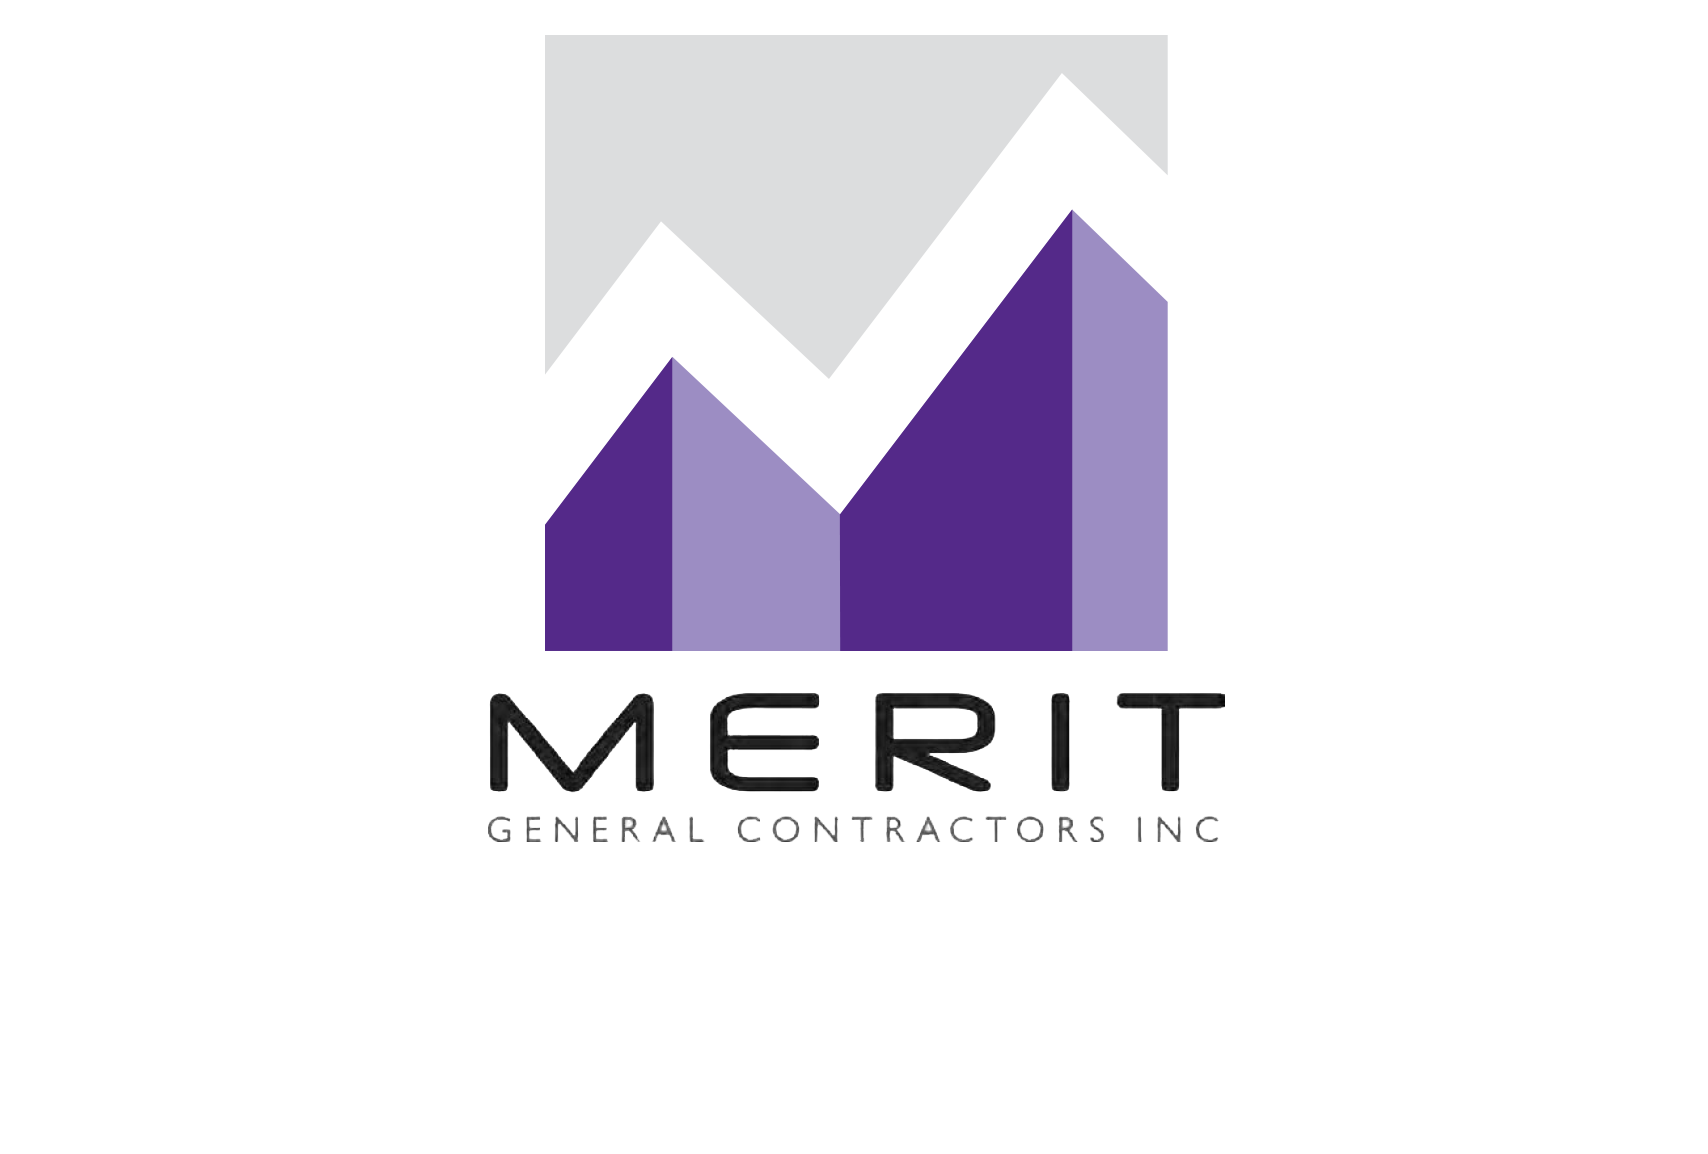 Merit General Contractors